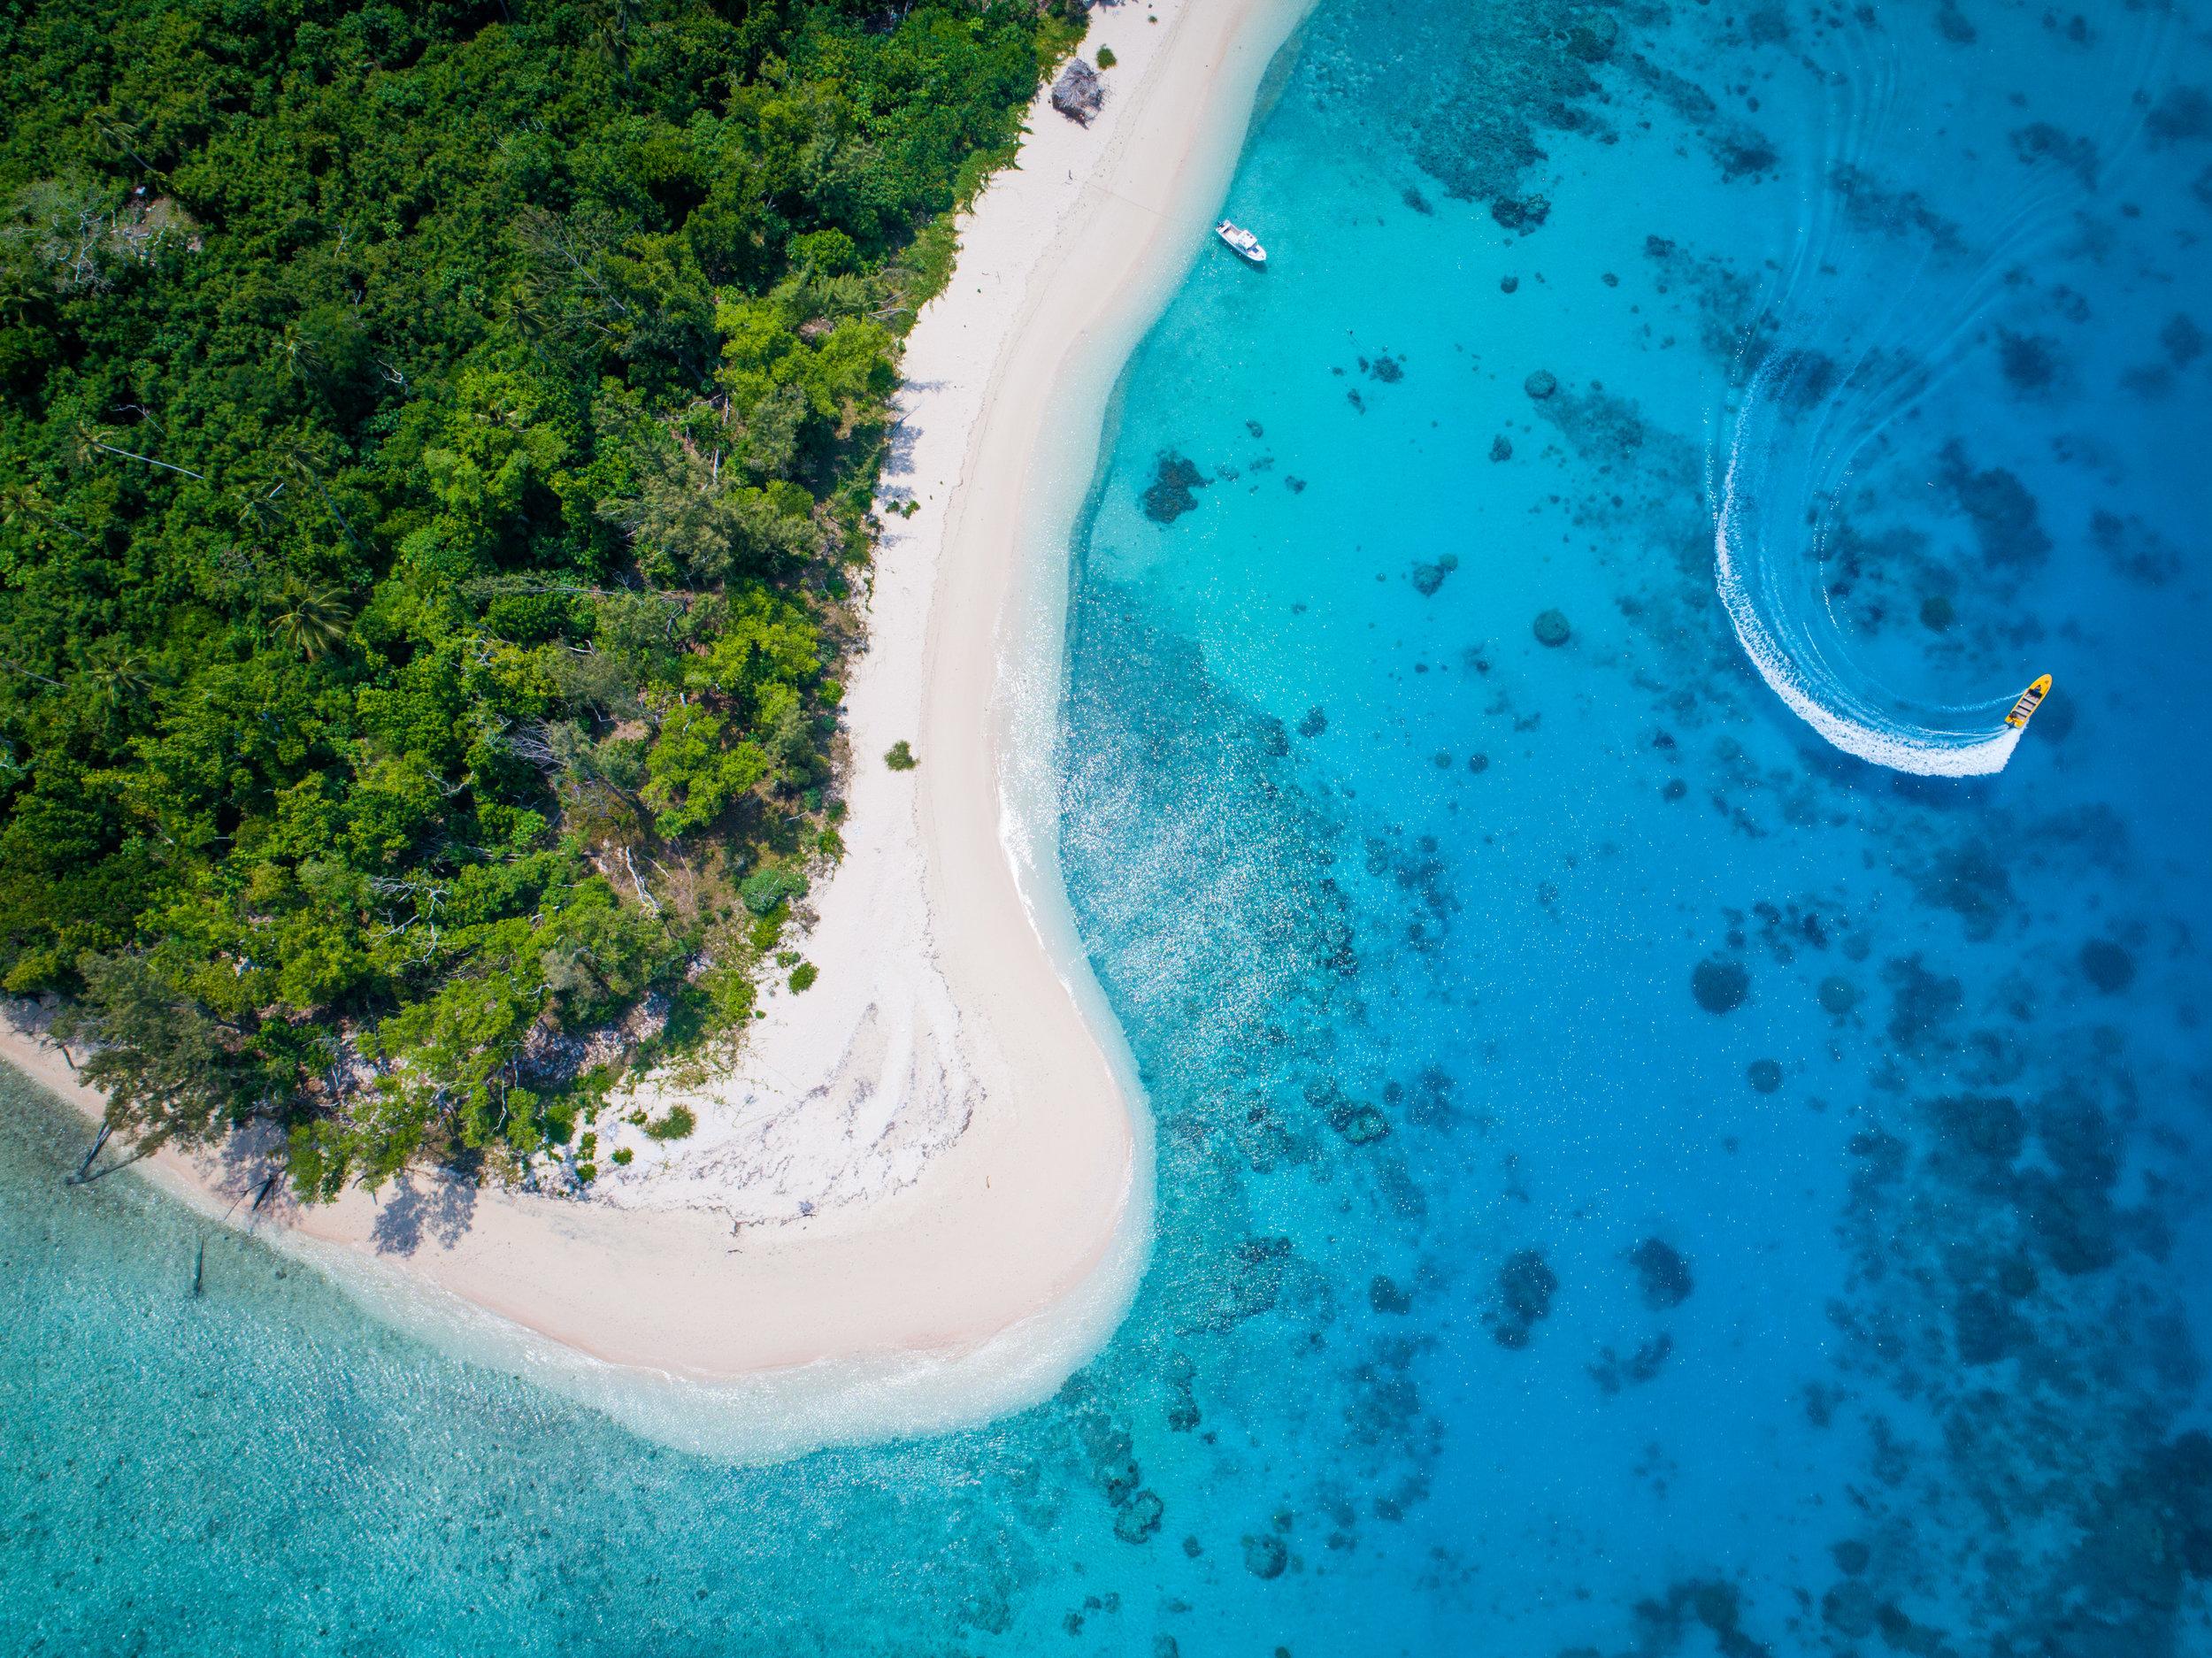 kakula_island_tip_north_efate_landscape.jpg